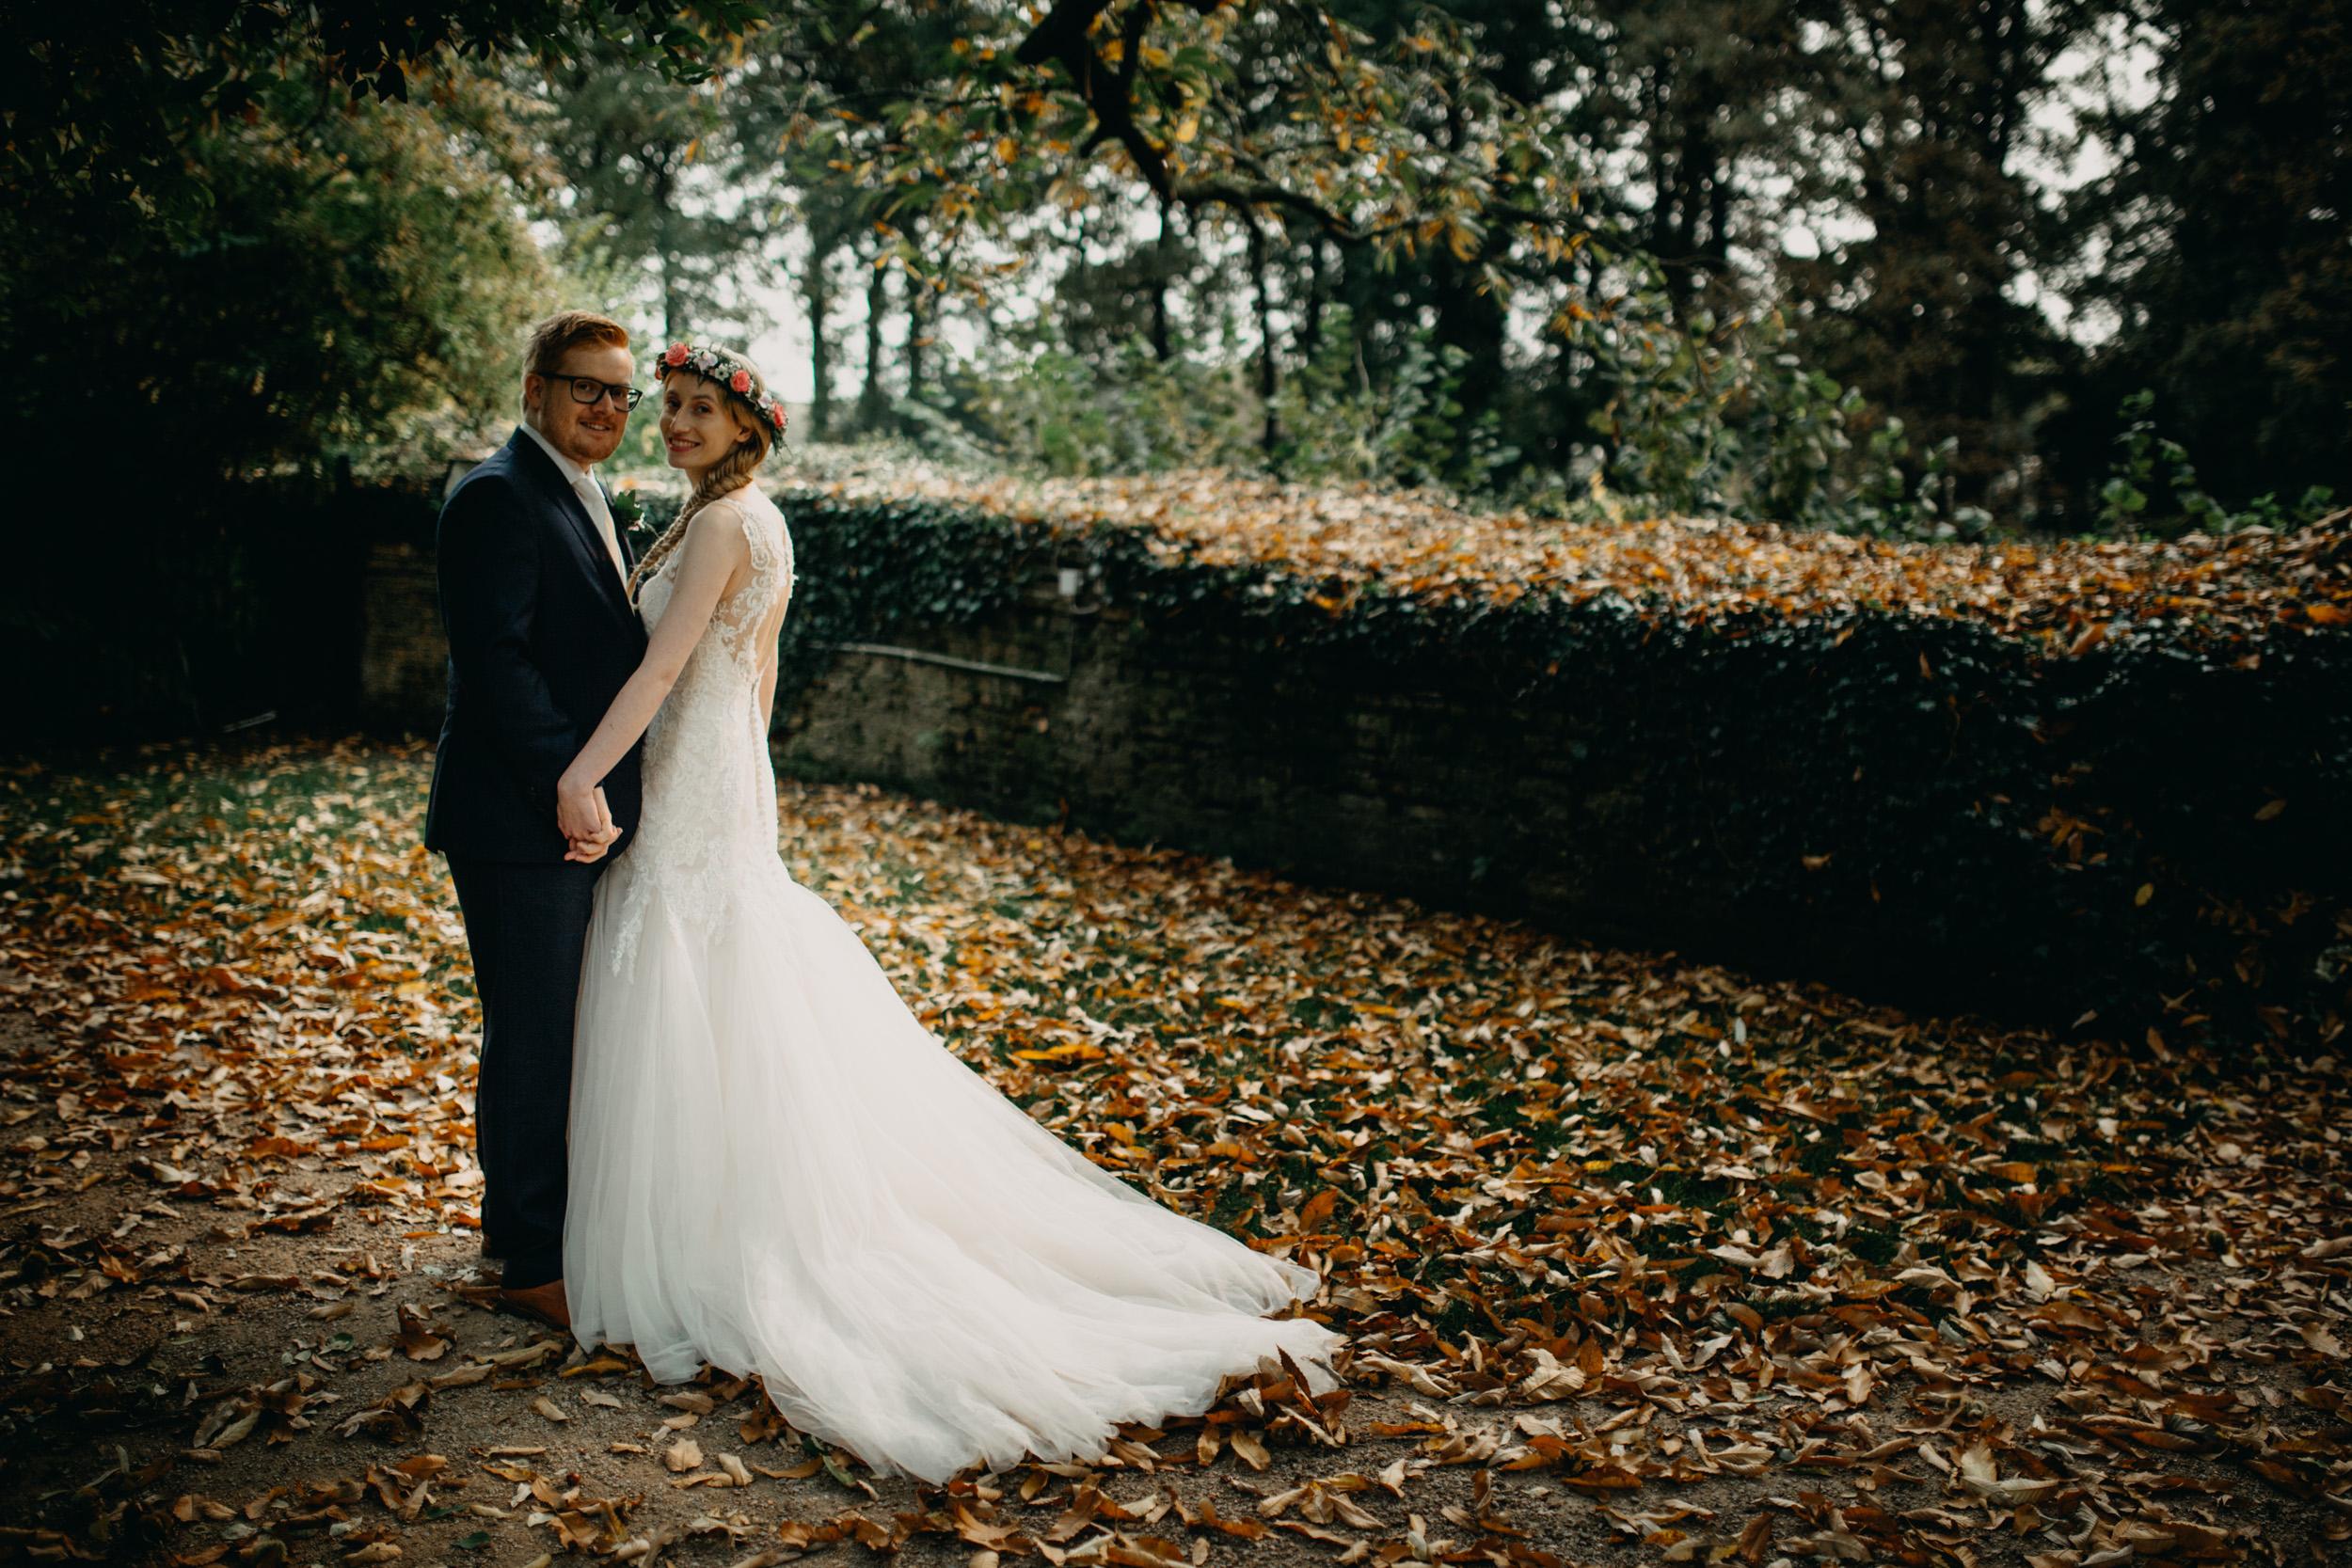 herfst-bruiloft-slot-doddendael-arnhem-nijmegen